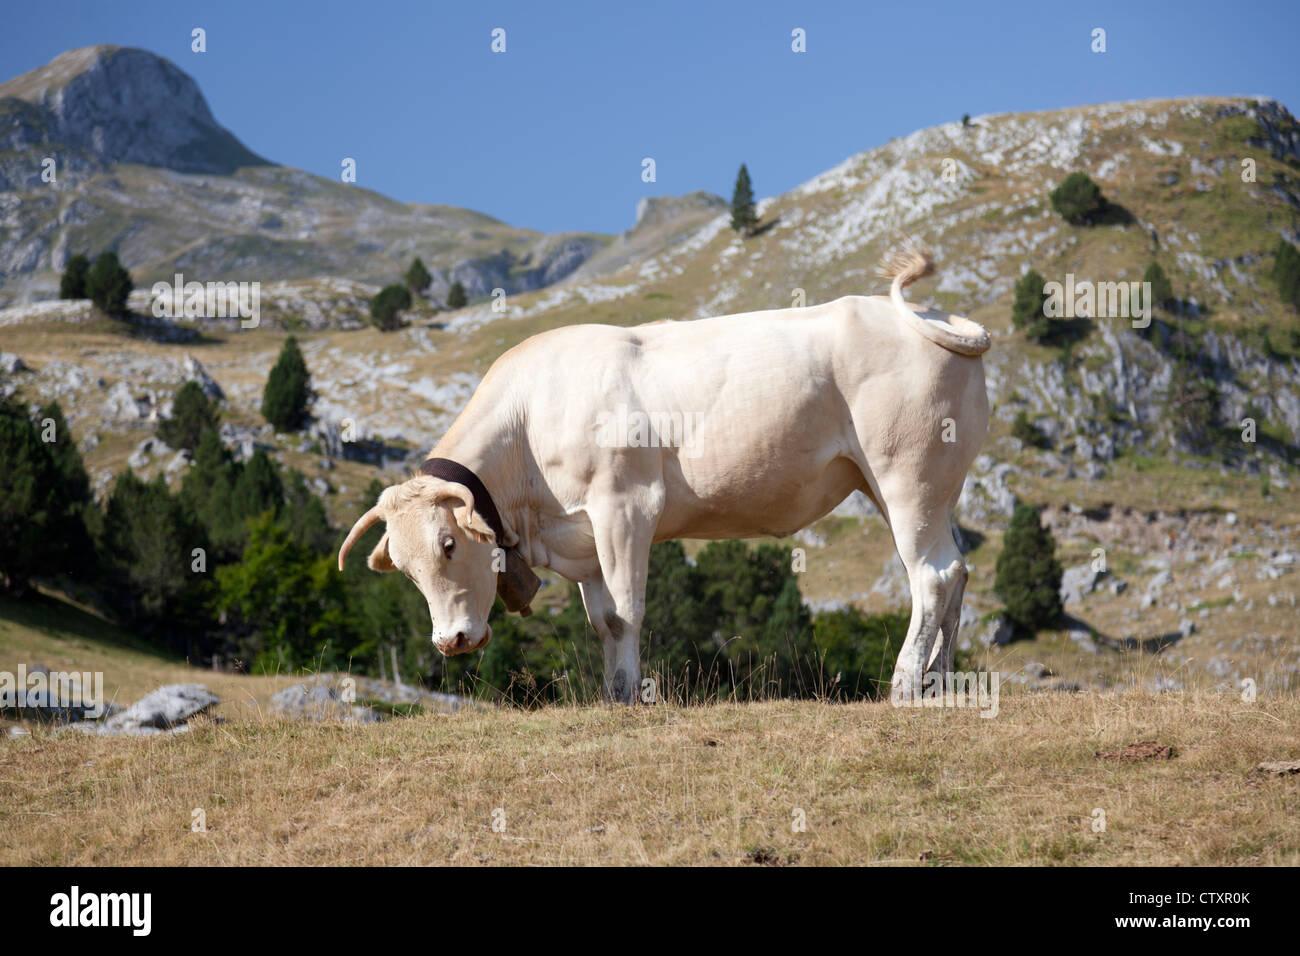 A blonde d'Aquitaine cow at its Summer pasture (Pic du Midi d'Ossau regional Park - Aquitaine - France). - Stock Image